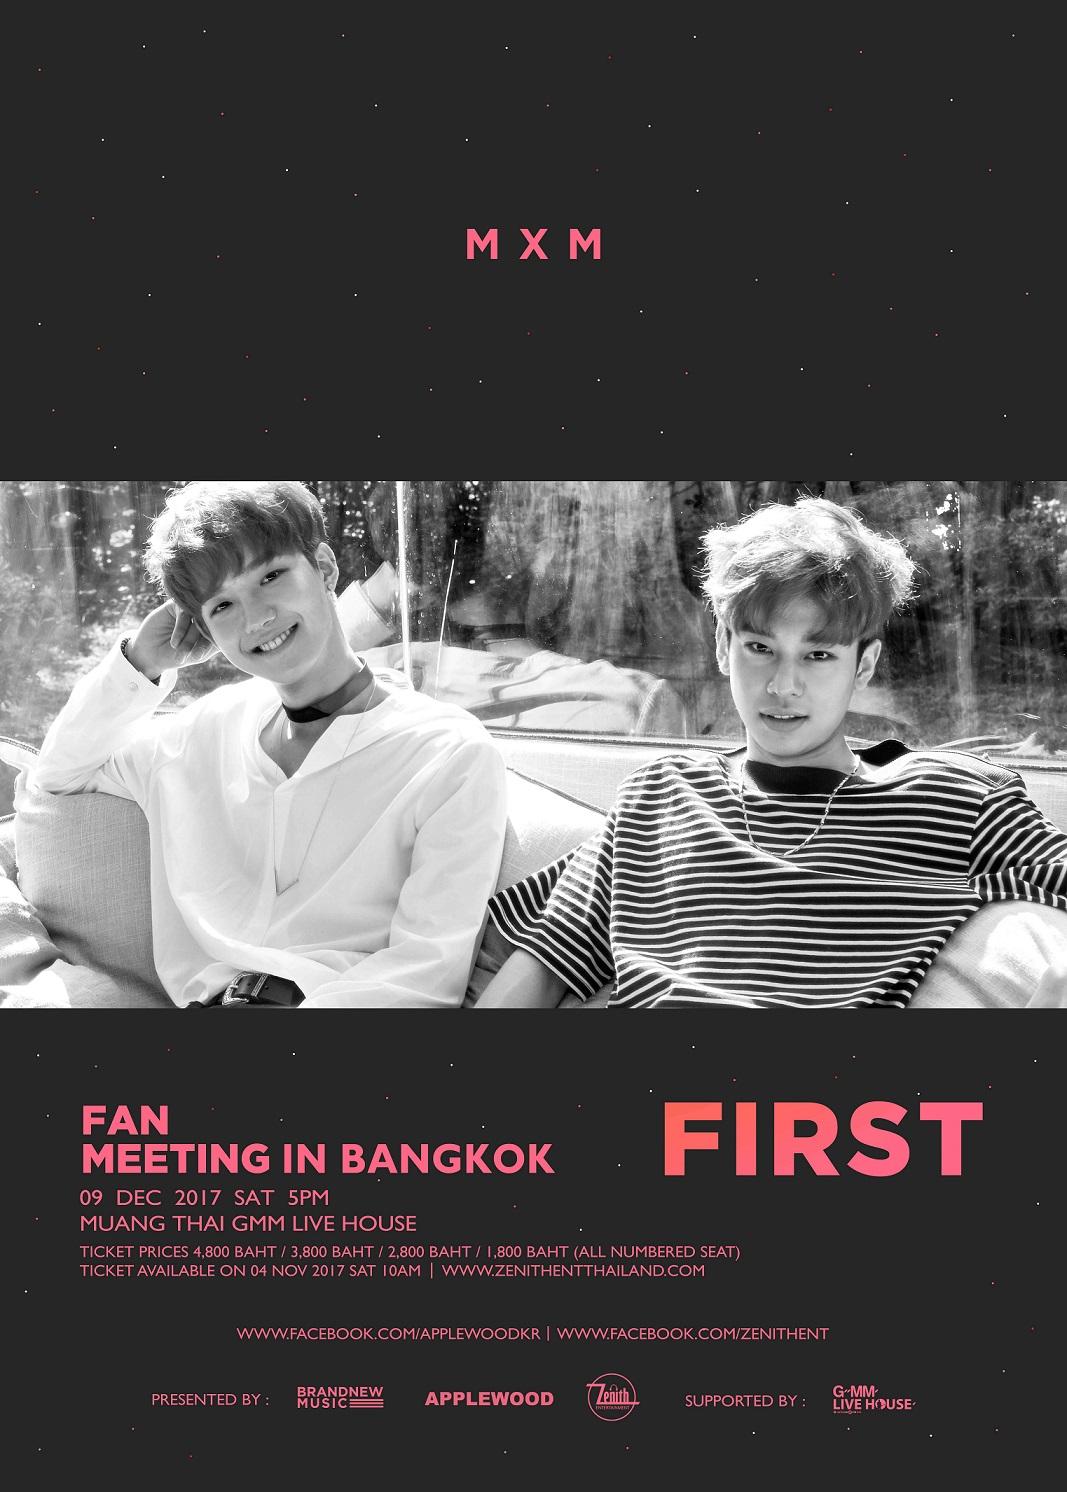 MXM_FIRST_BKK_POSTER_1028